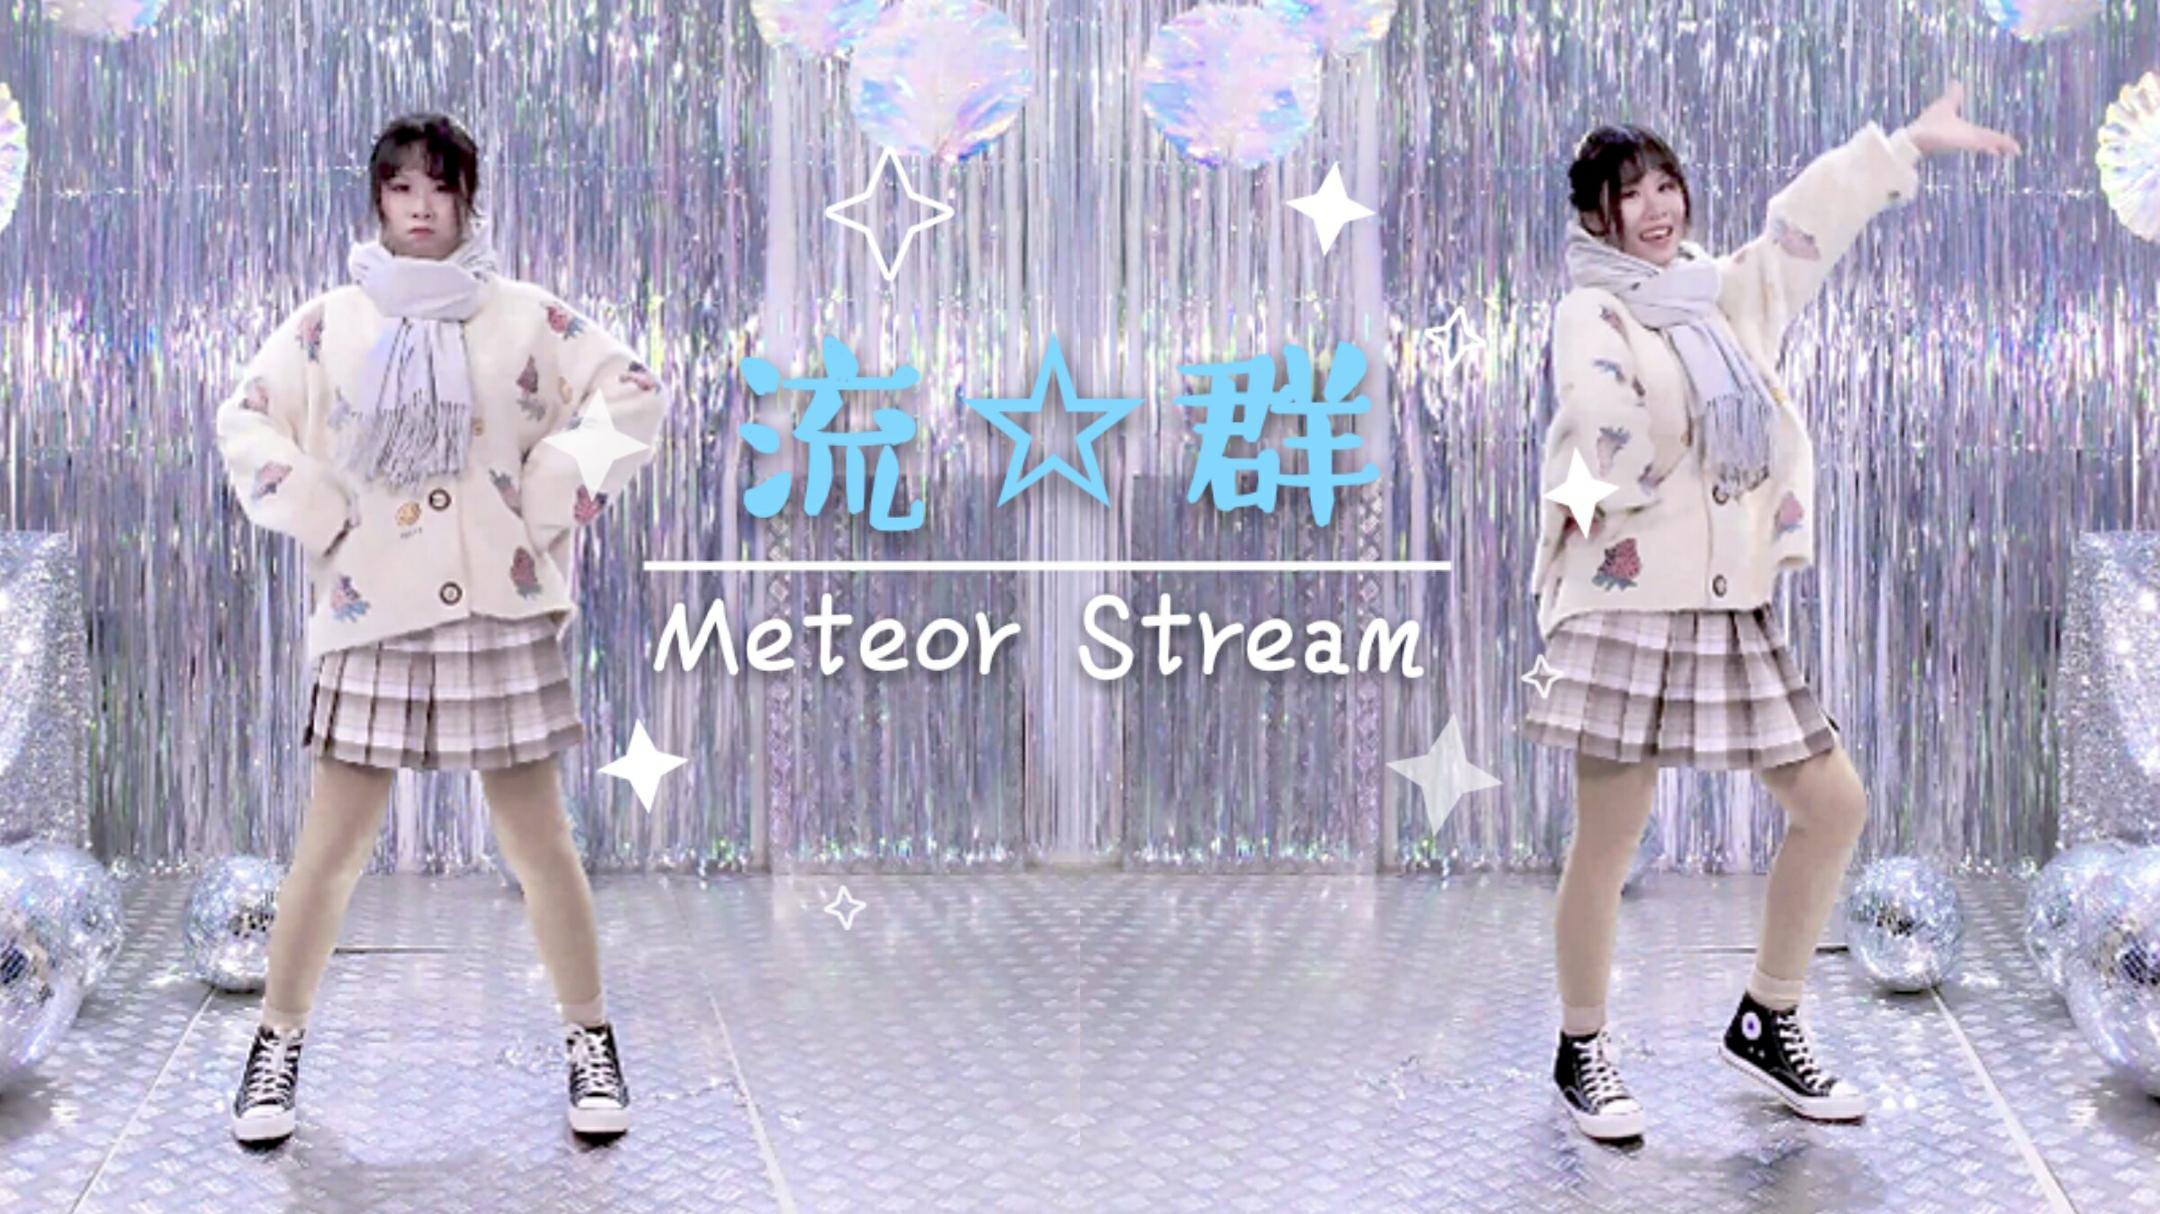 【乔樱】流☆群 Meteor Stream[文艺复兴]